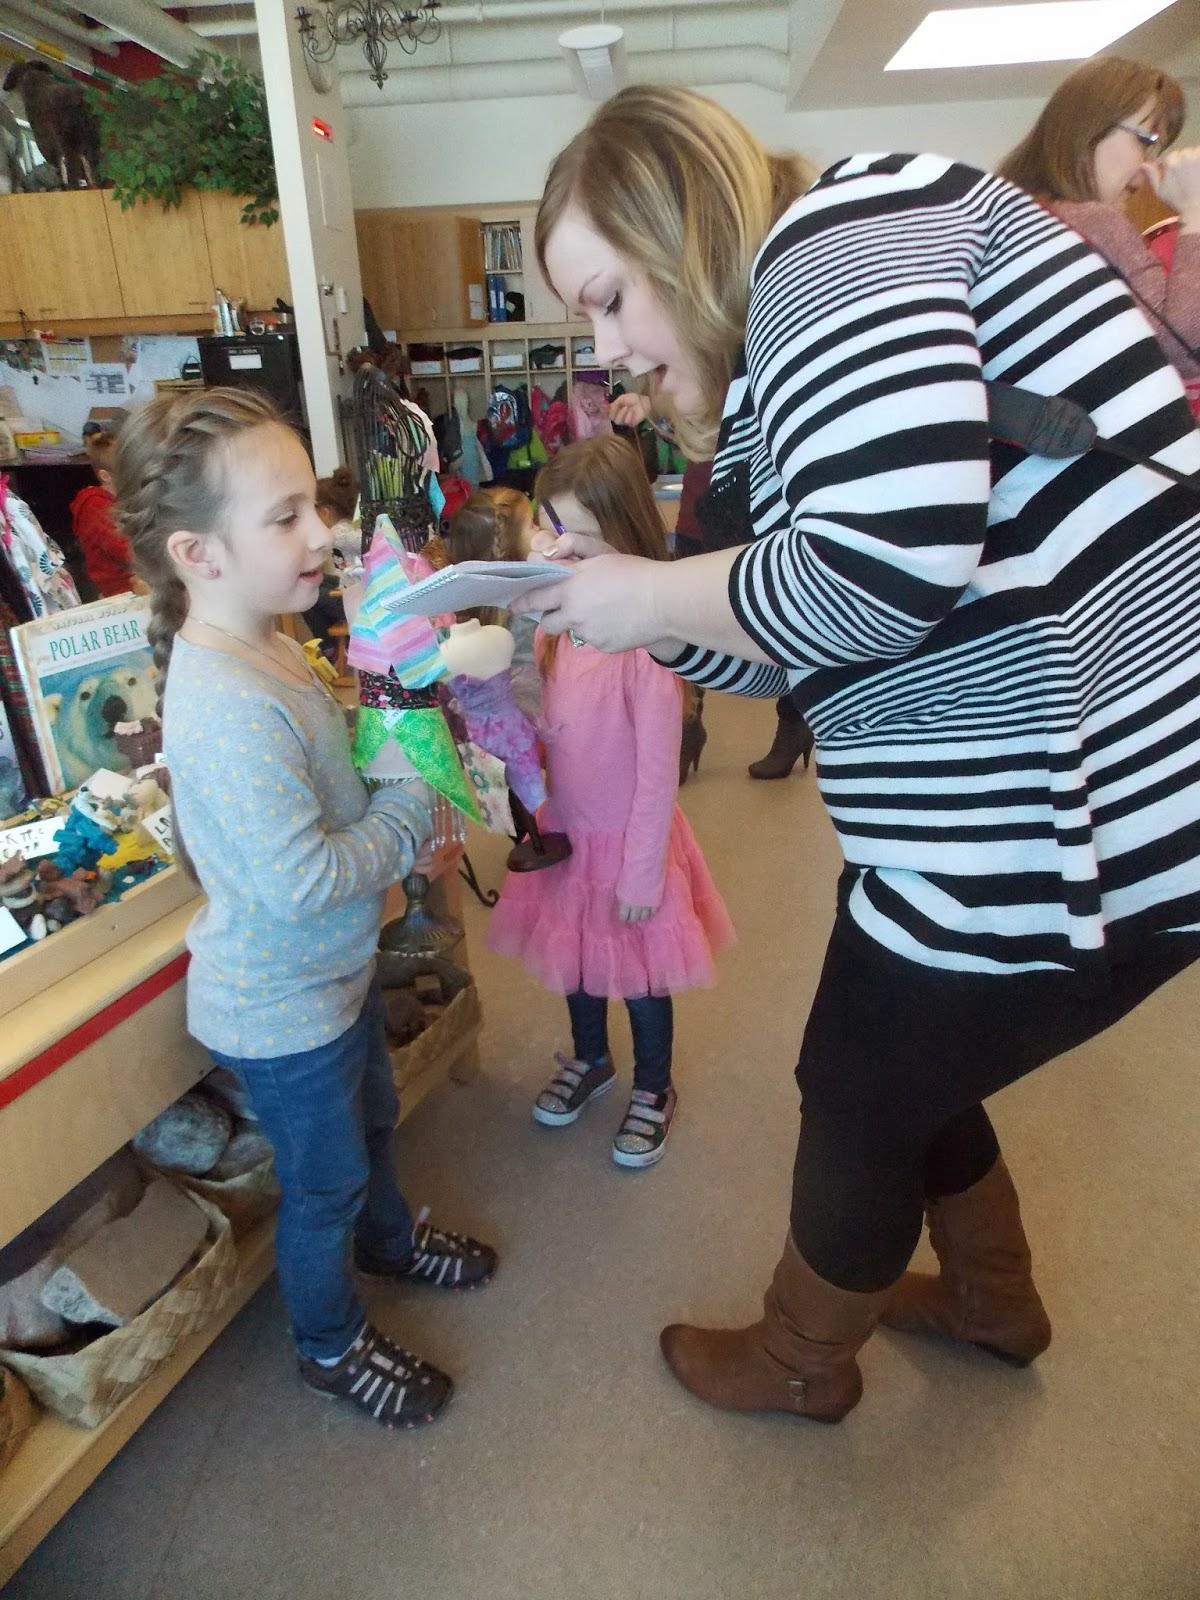 The Wonderful World Of Kindergarten Karen Hall And The St Clair College Design Team Come To Kindergarten